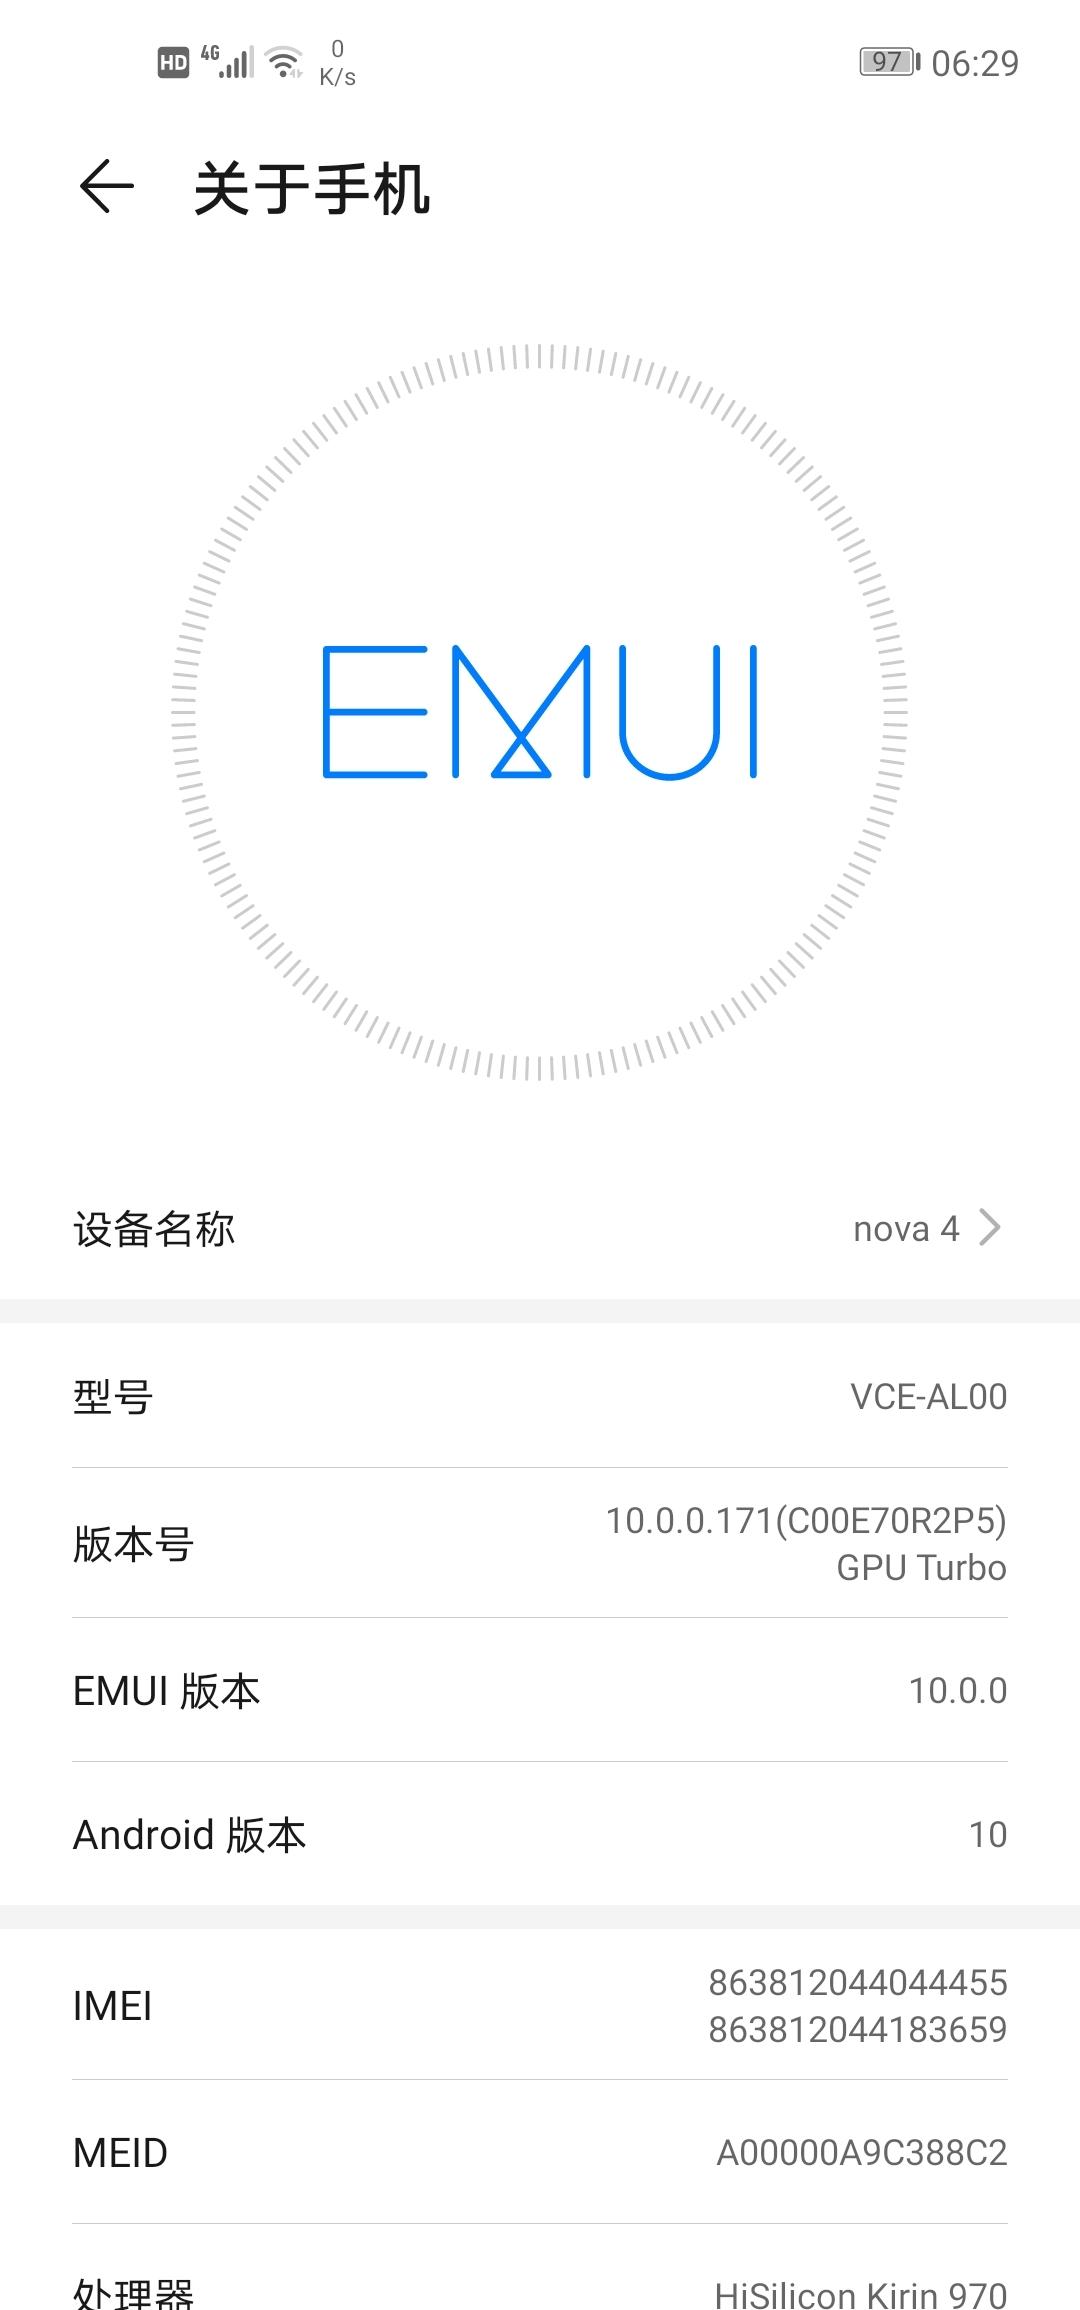 Screenshot_20210616_062927_com.android.settings.jpg